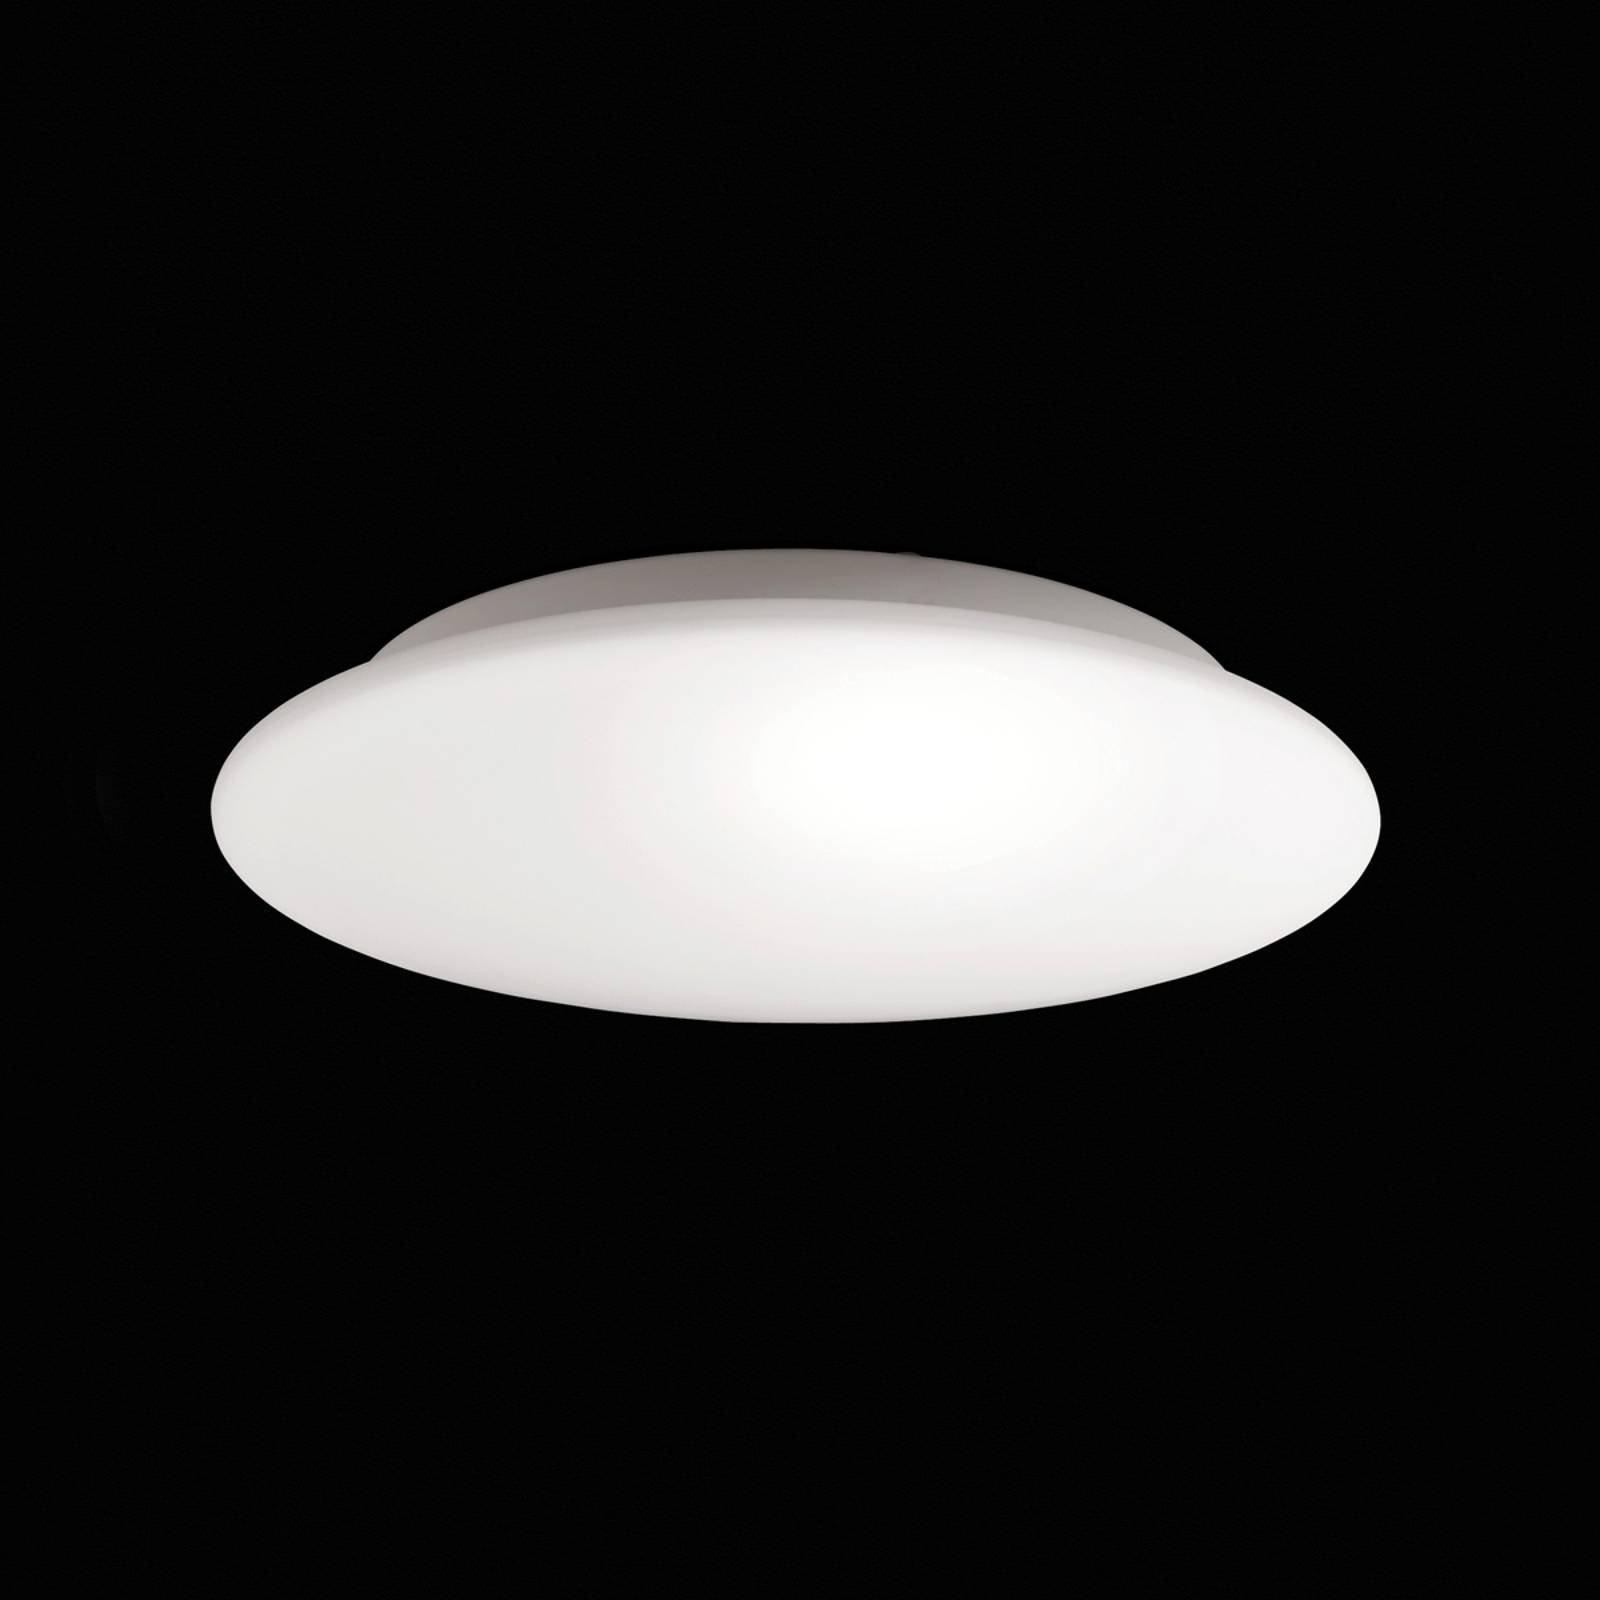 Klassisk taklampe Bianca 25 cm